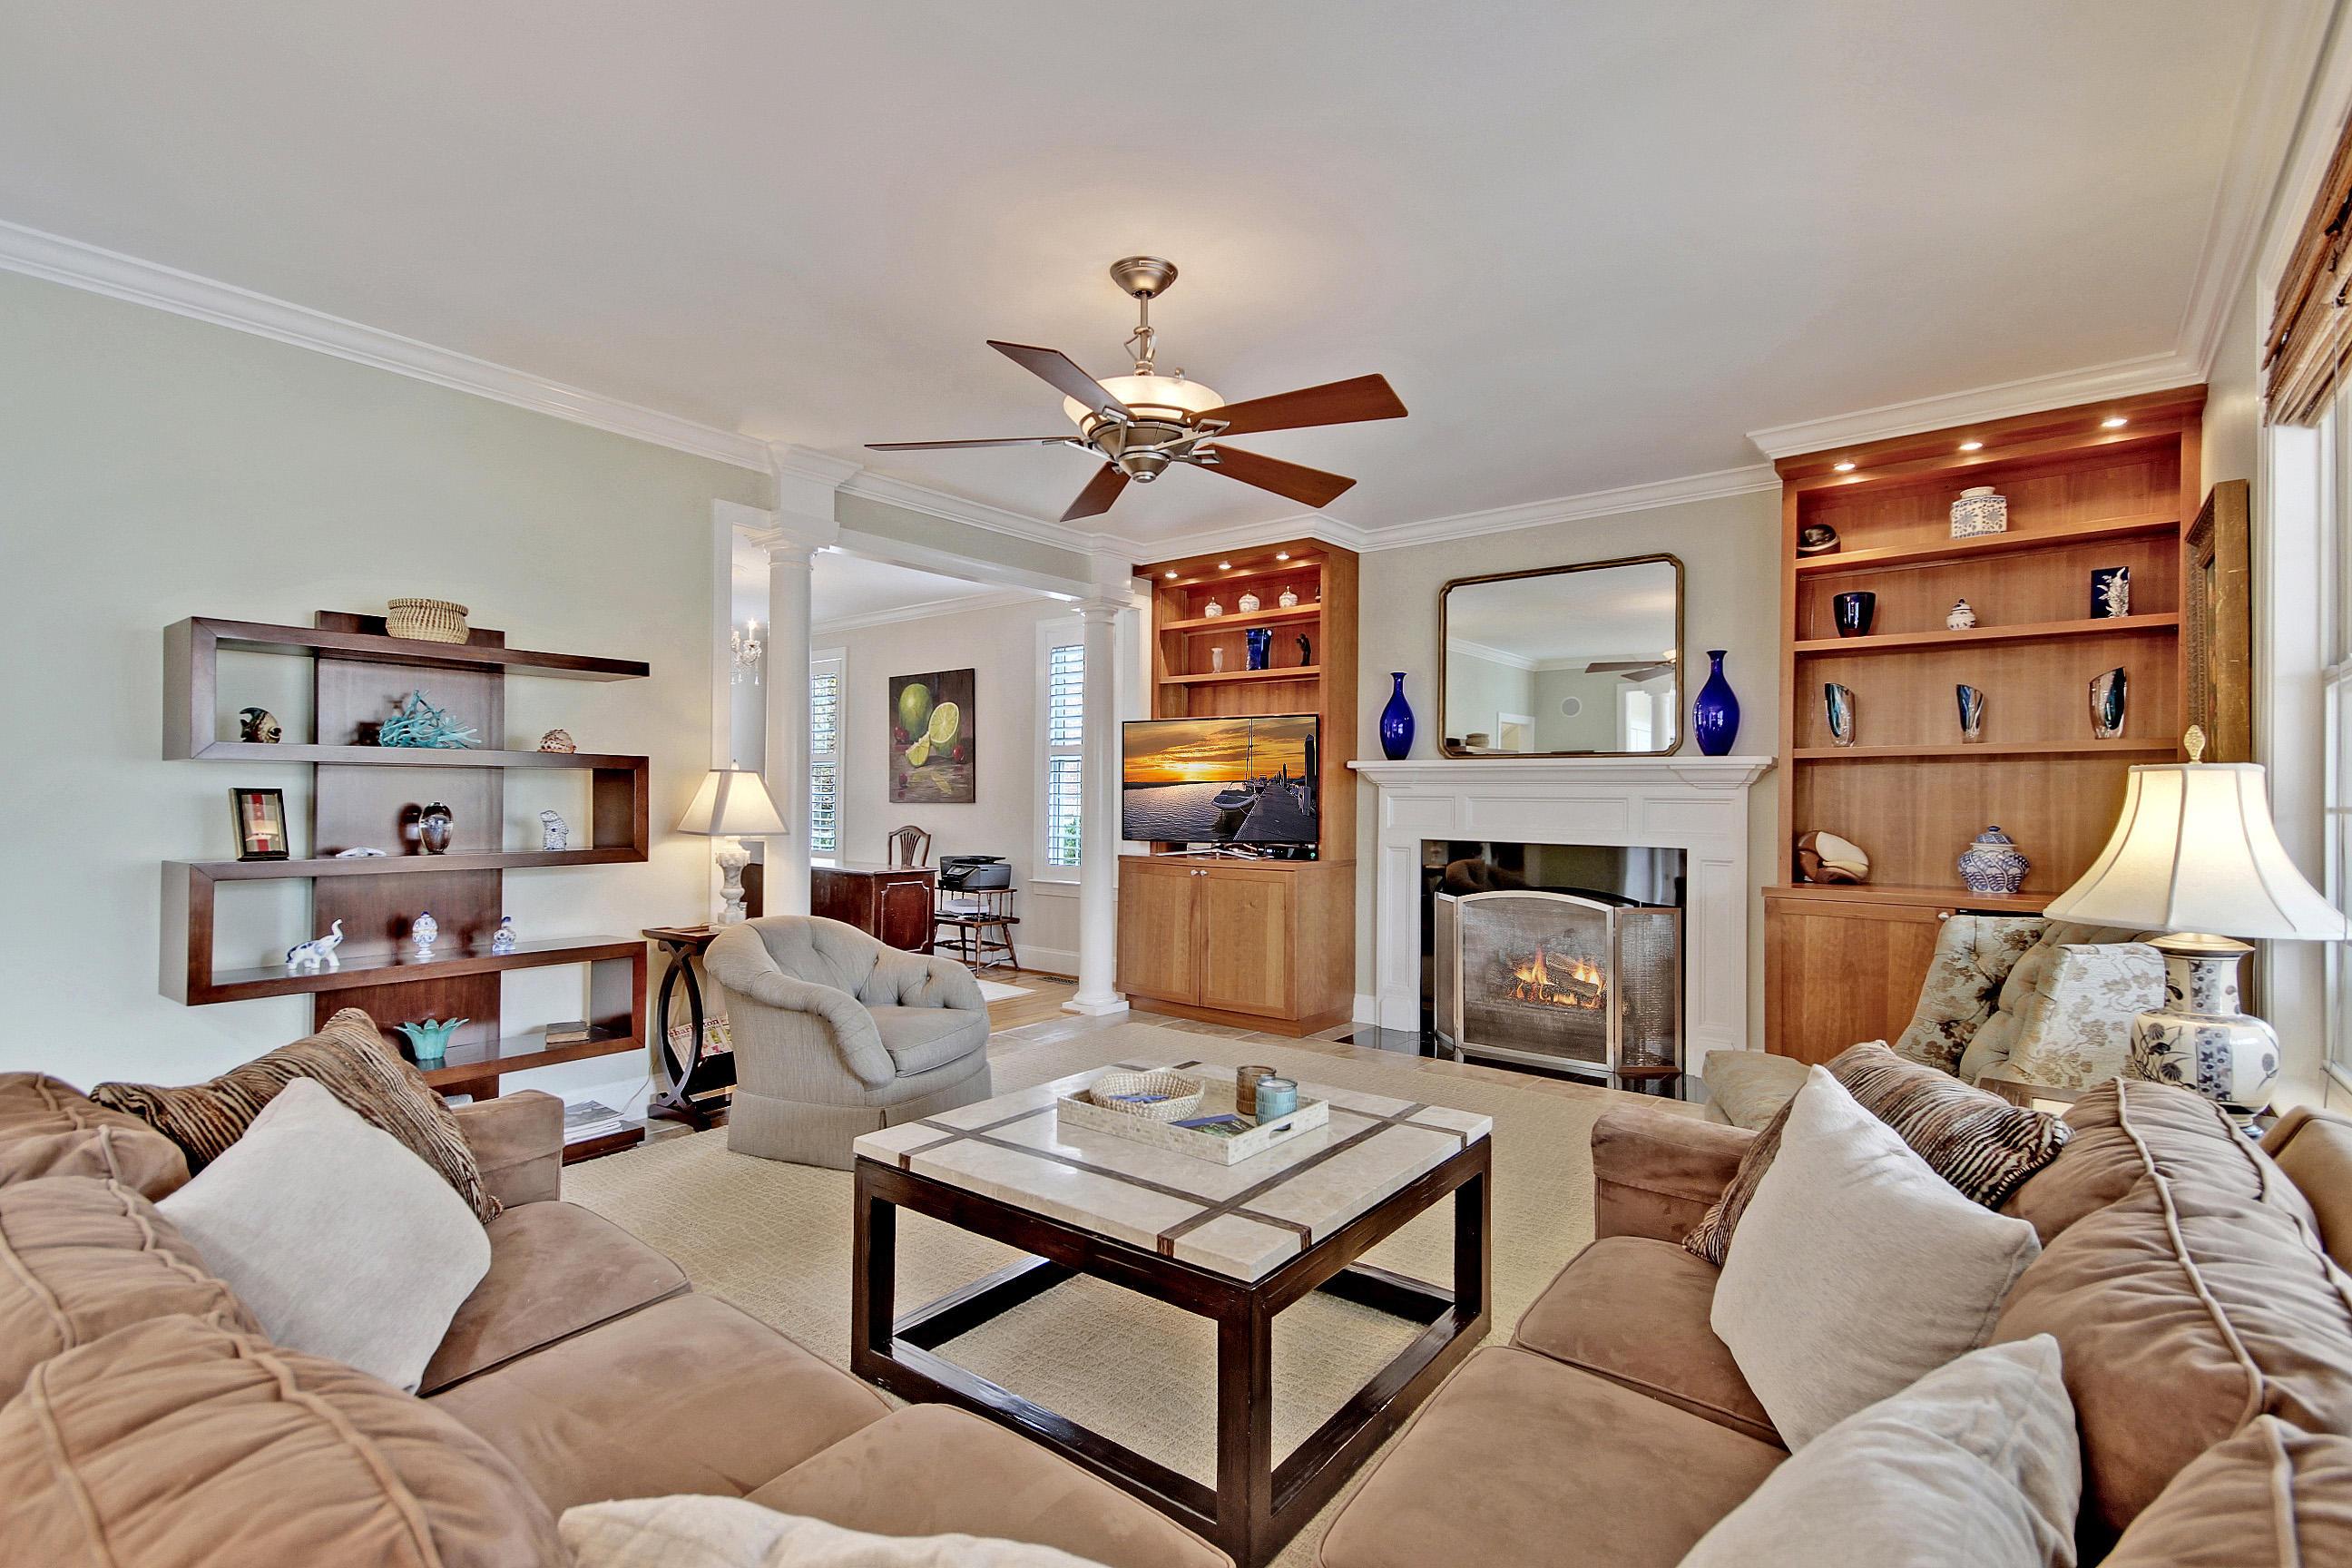 Dunes West Homes For Sale - 2364 Darts Cove, Mount Pleasant, SC - 35